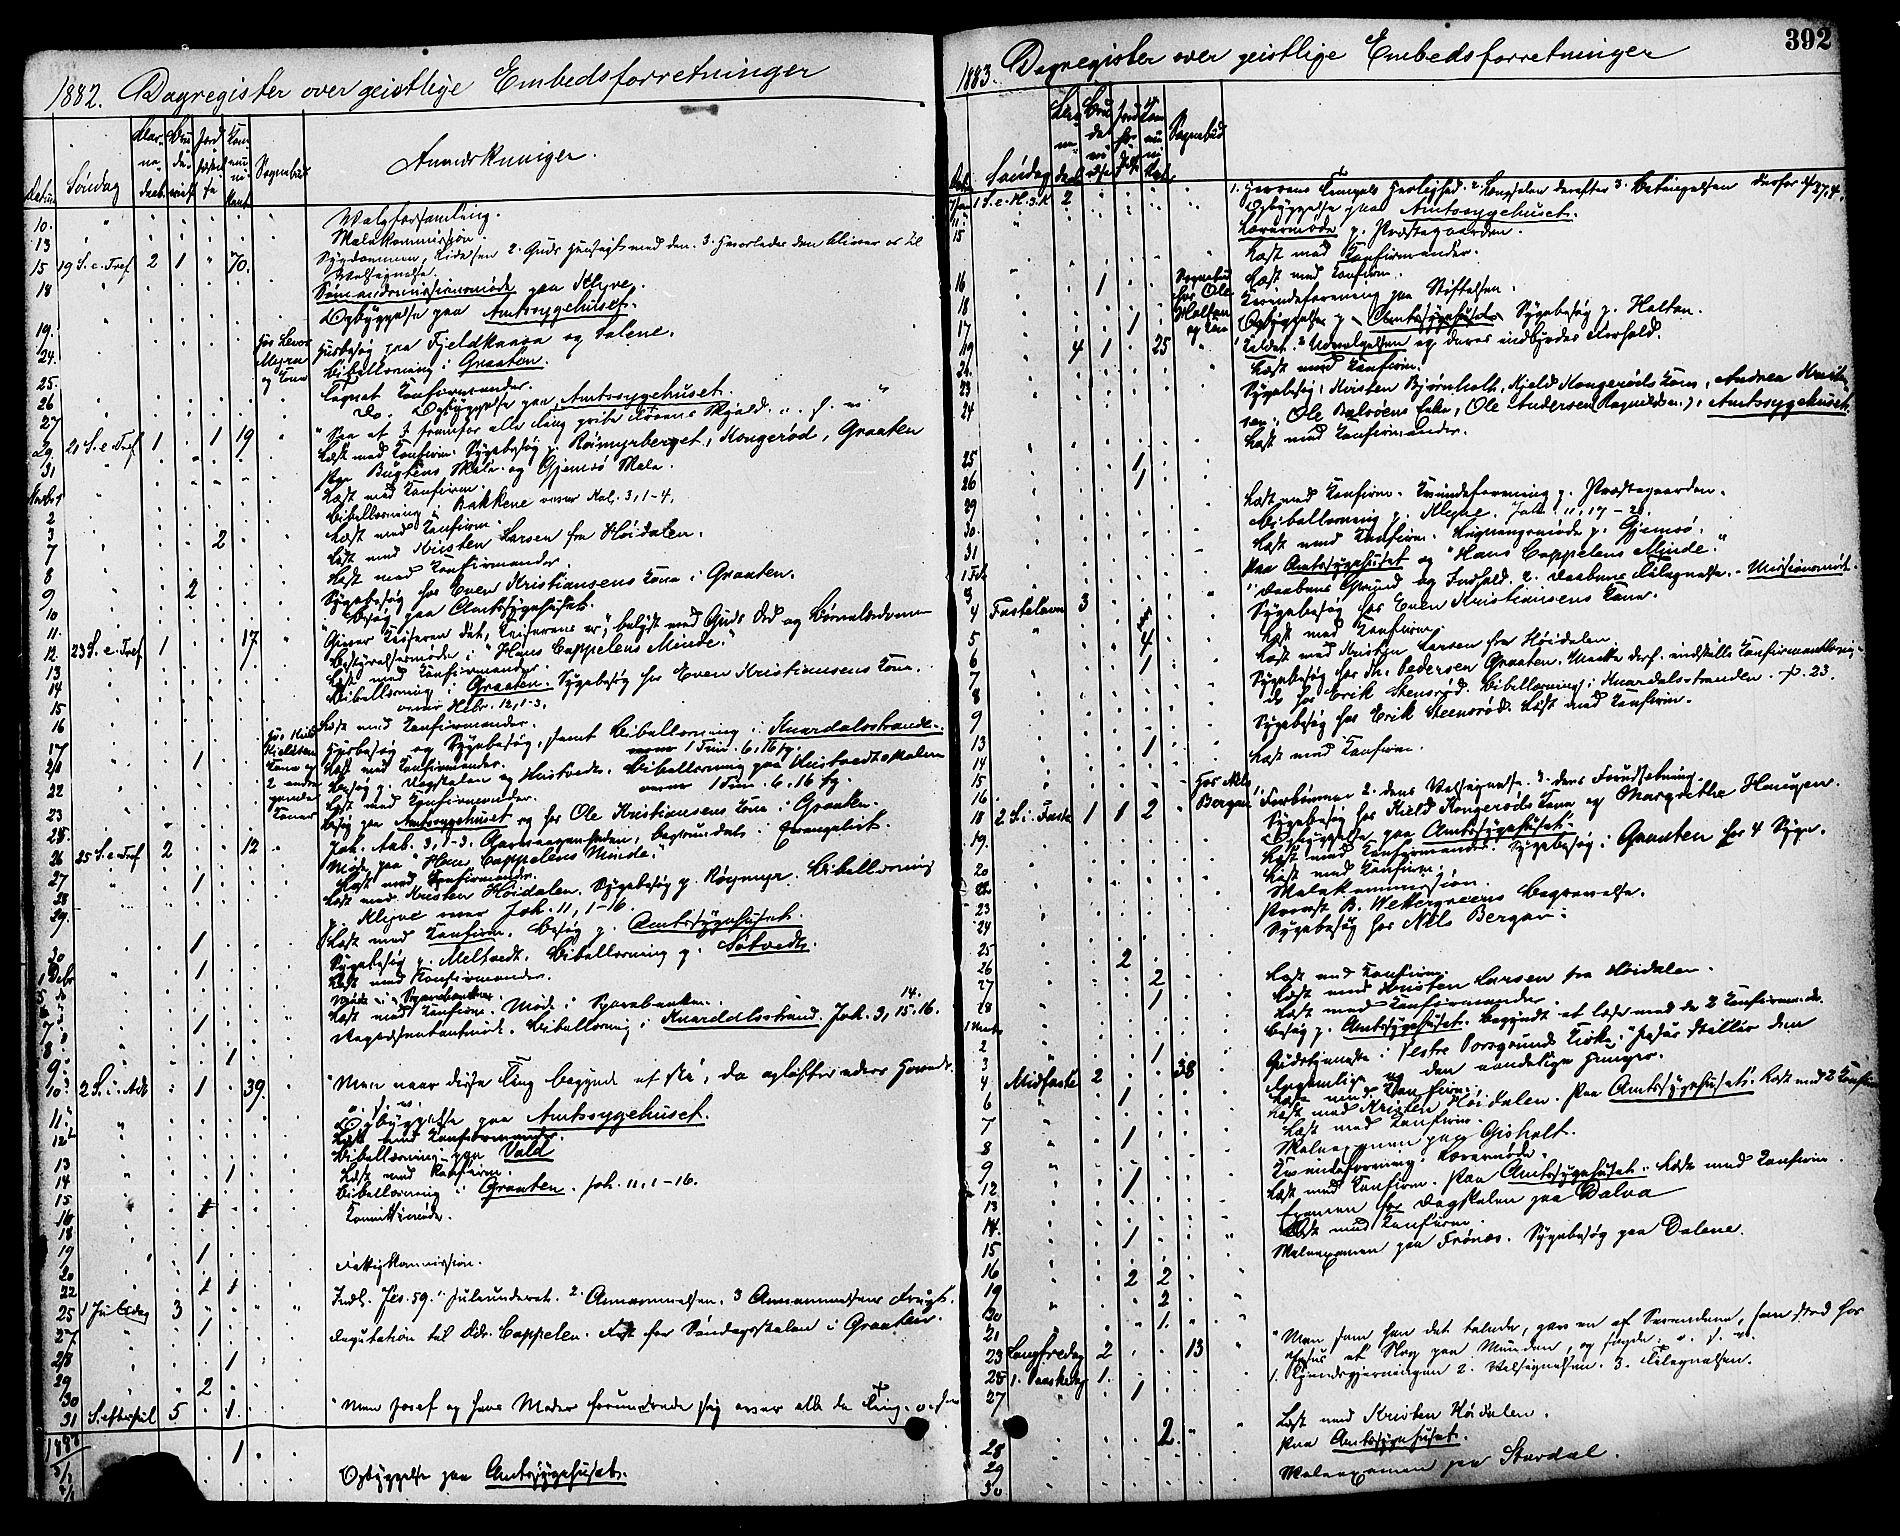 SAKO, Solum kirkebøker, F/Fa/L0009: Ministerialbok nr. I 9, 1877-1887, s. 392